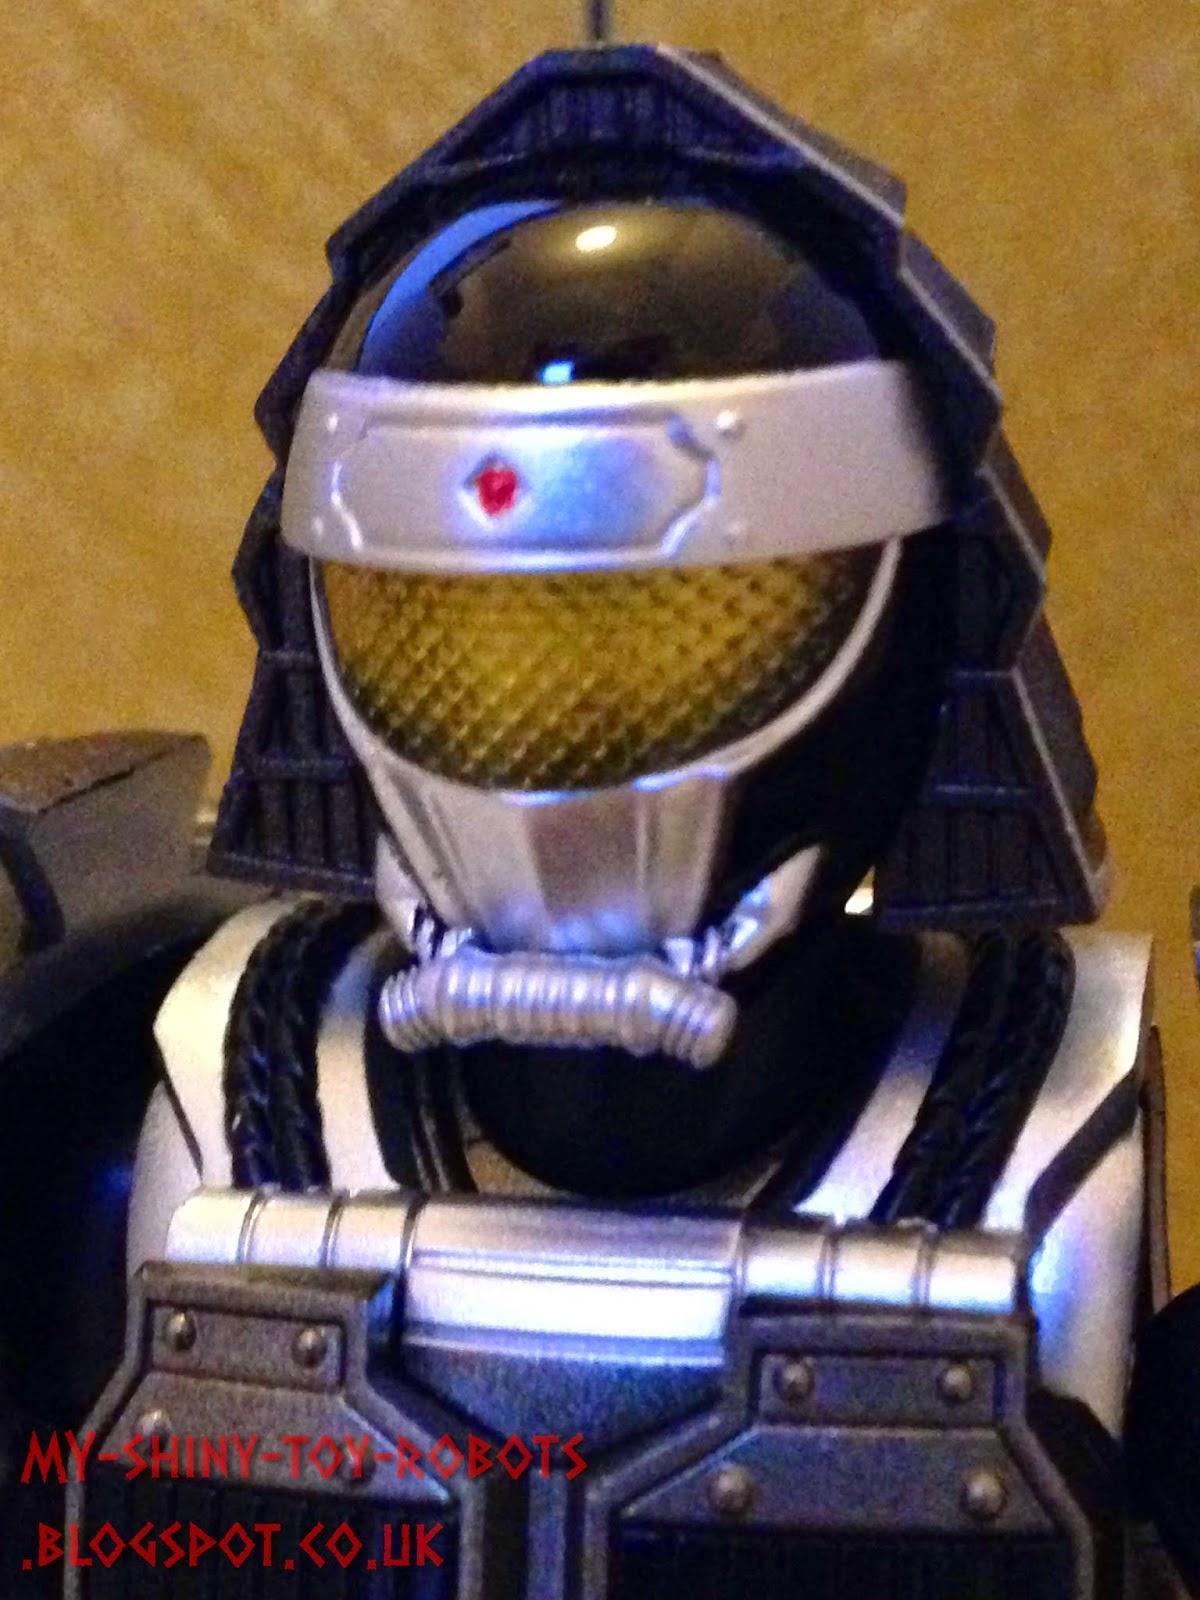 S.H. Figuarts Kamen Rider Kurokage